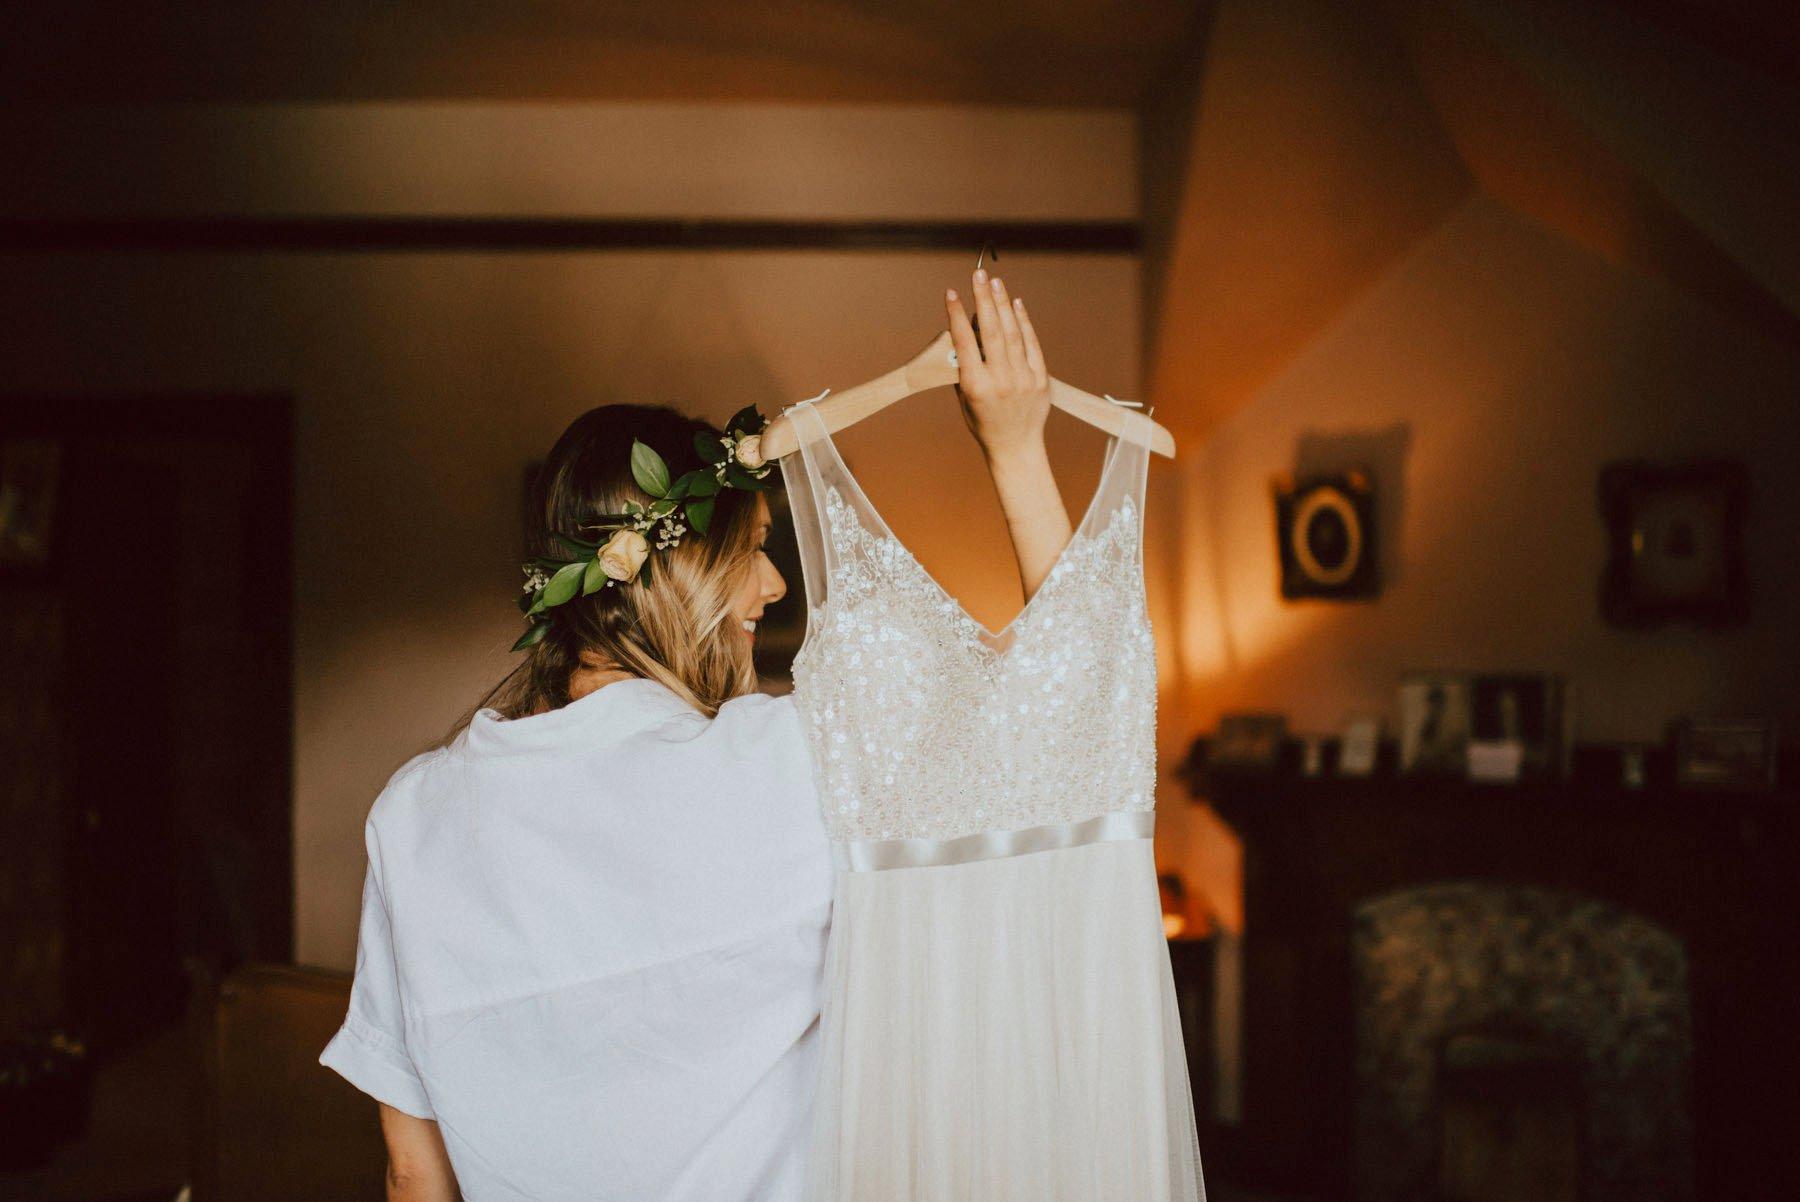 Knowlton-mansion-wedding-8.jpg